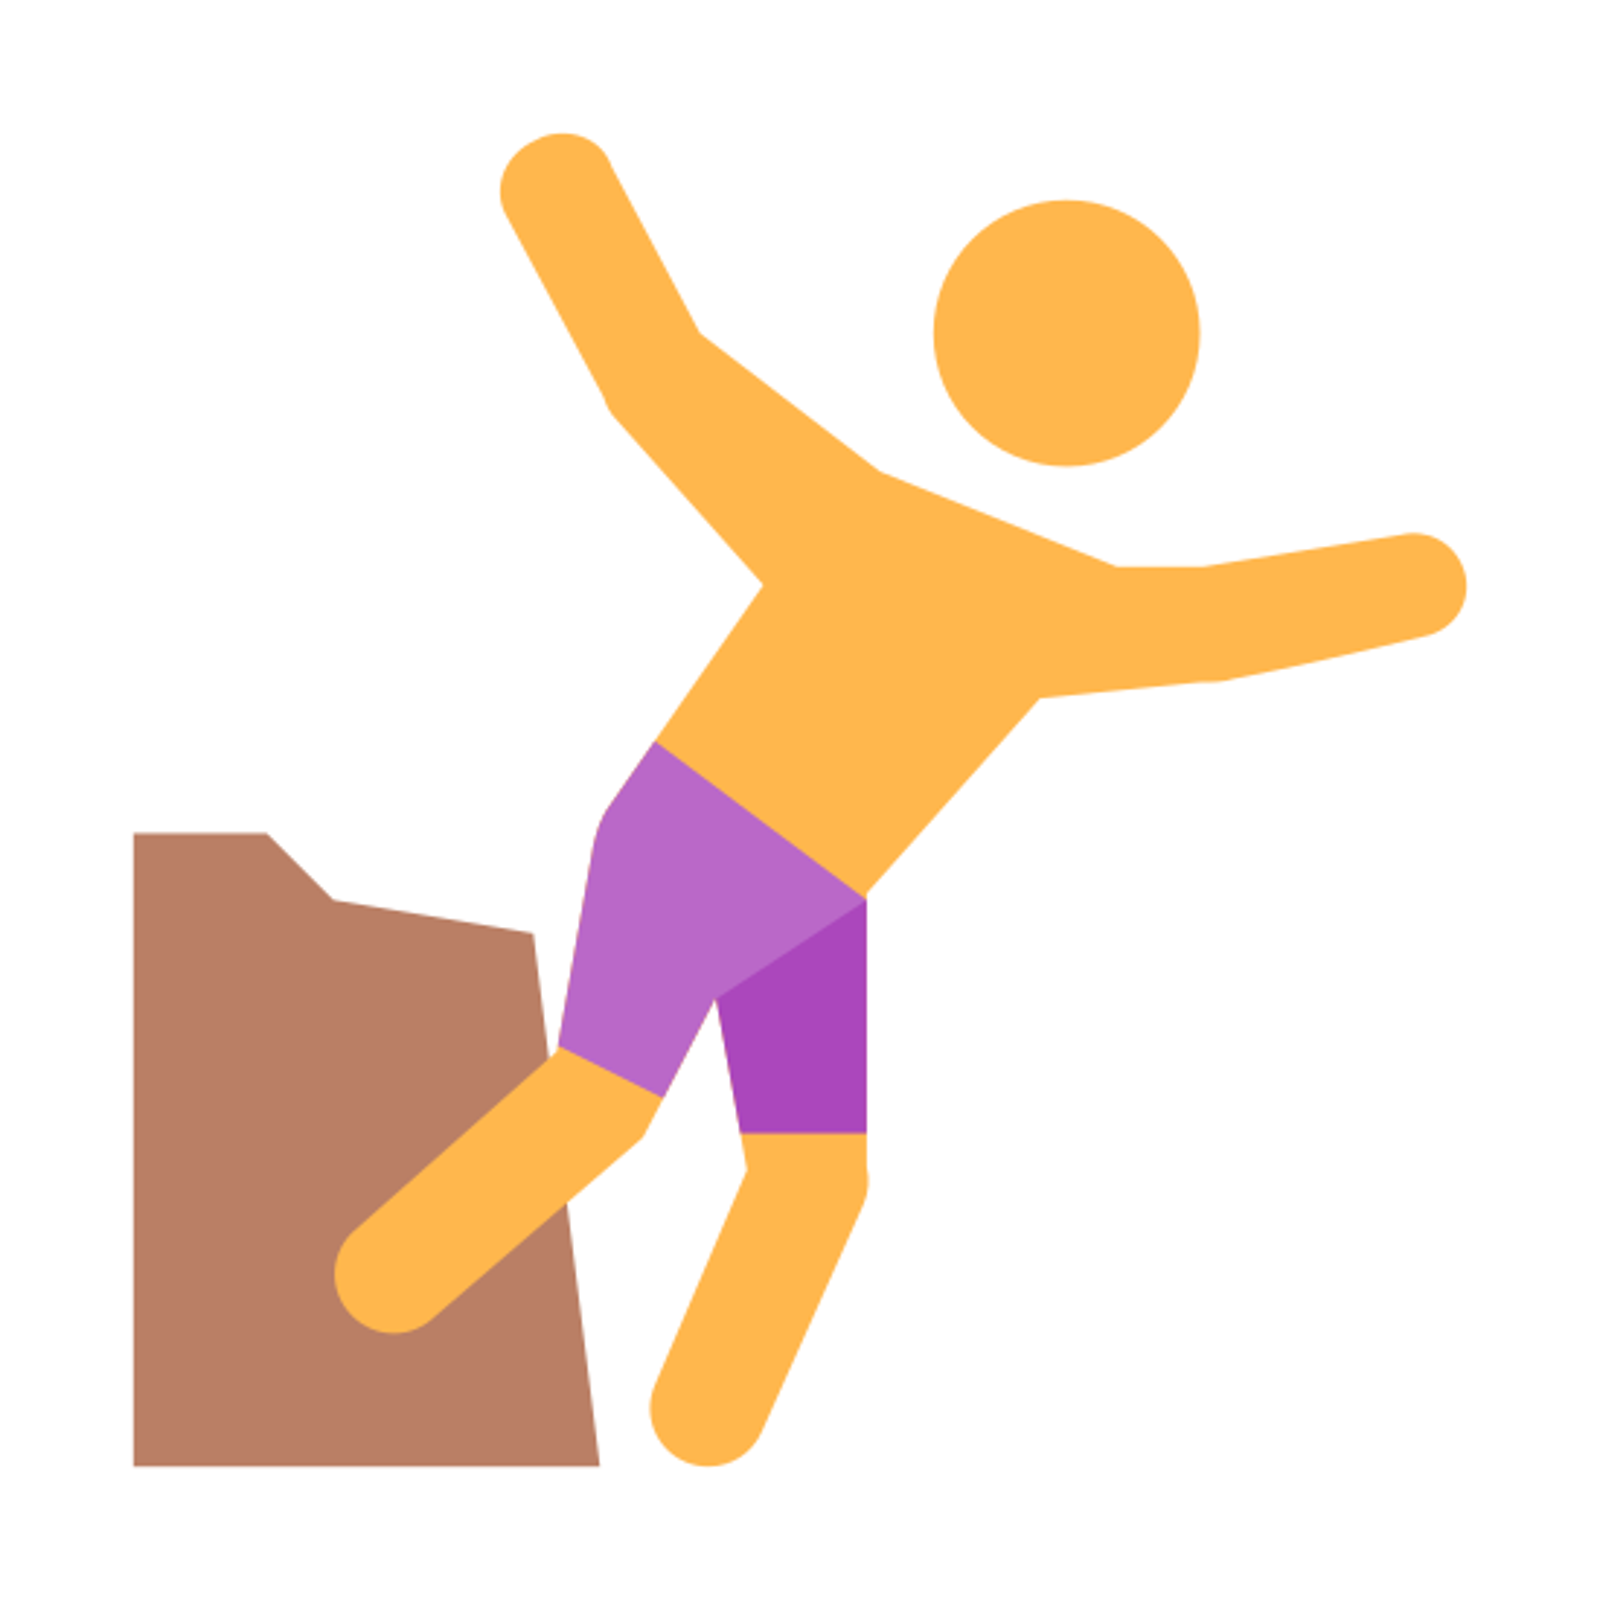 Salto de acantilado icon